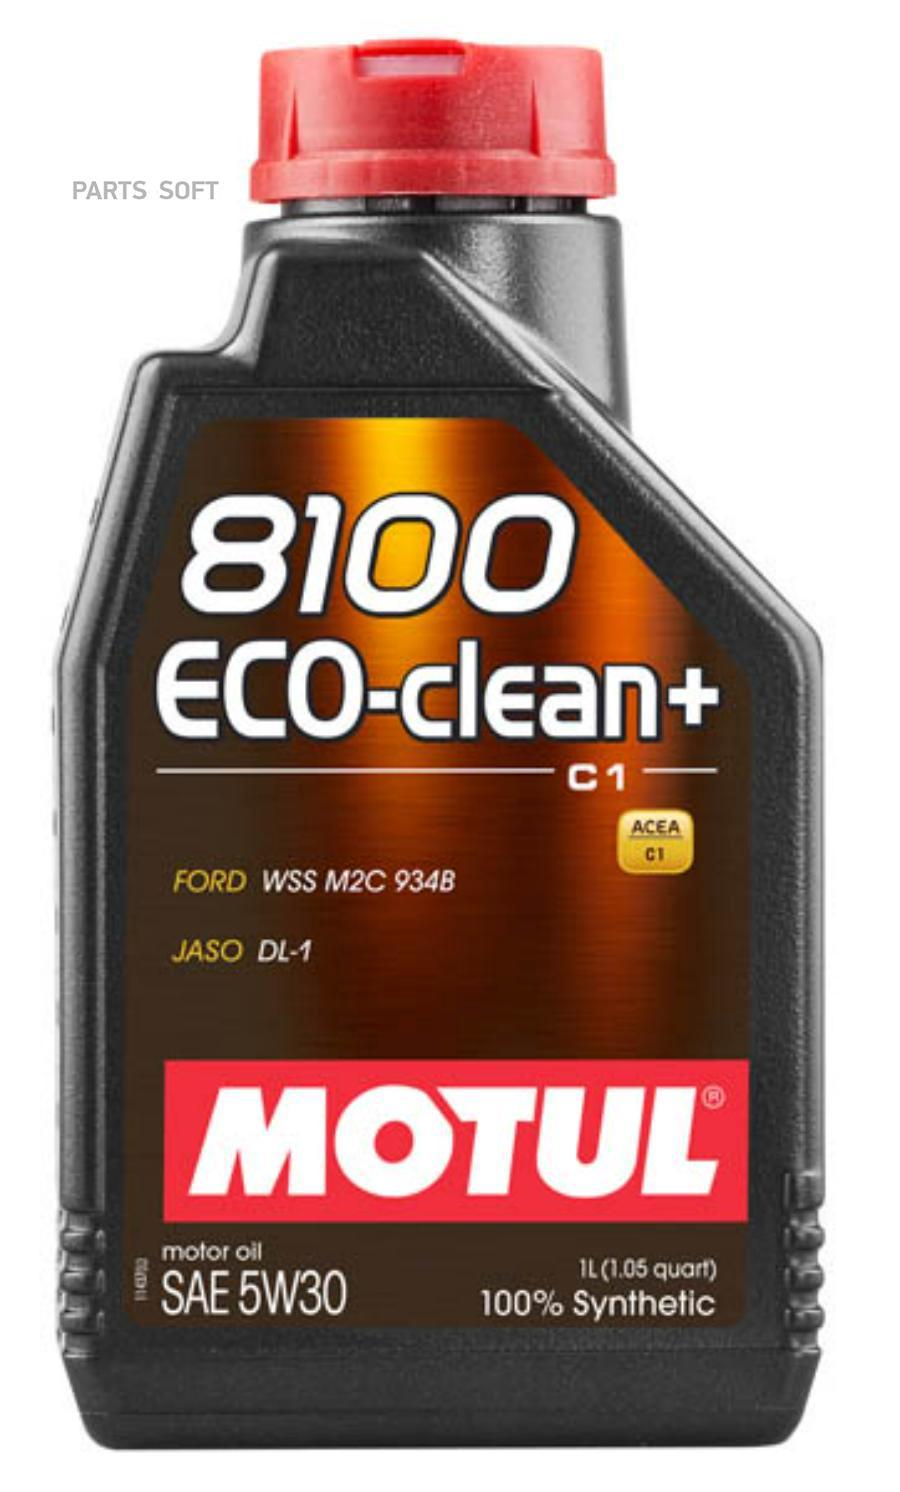 Motul 8100 ECO CLEAN PLUS .